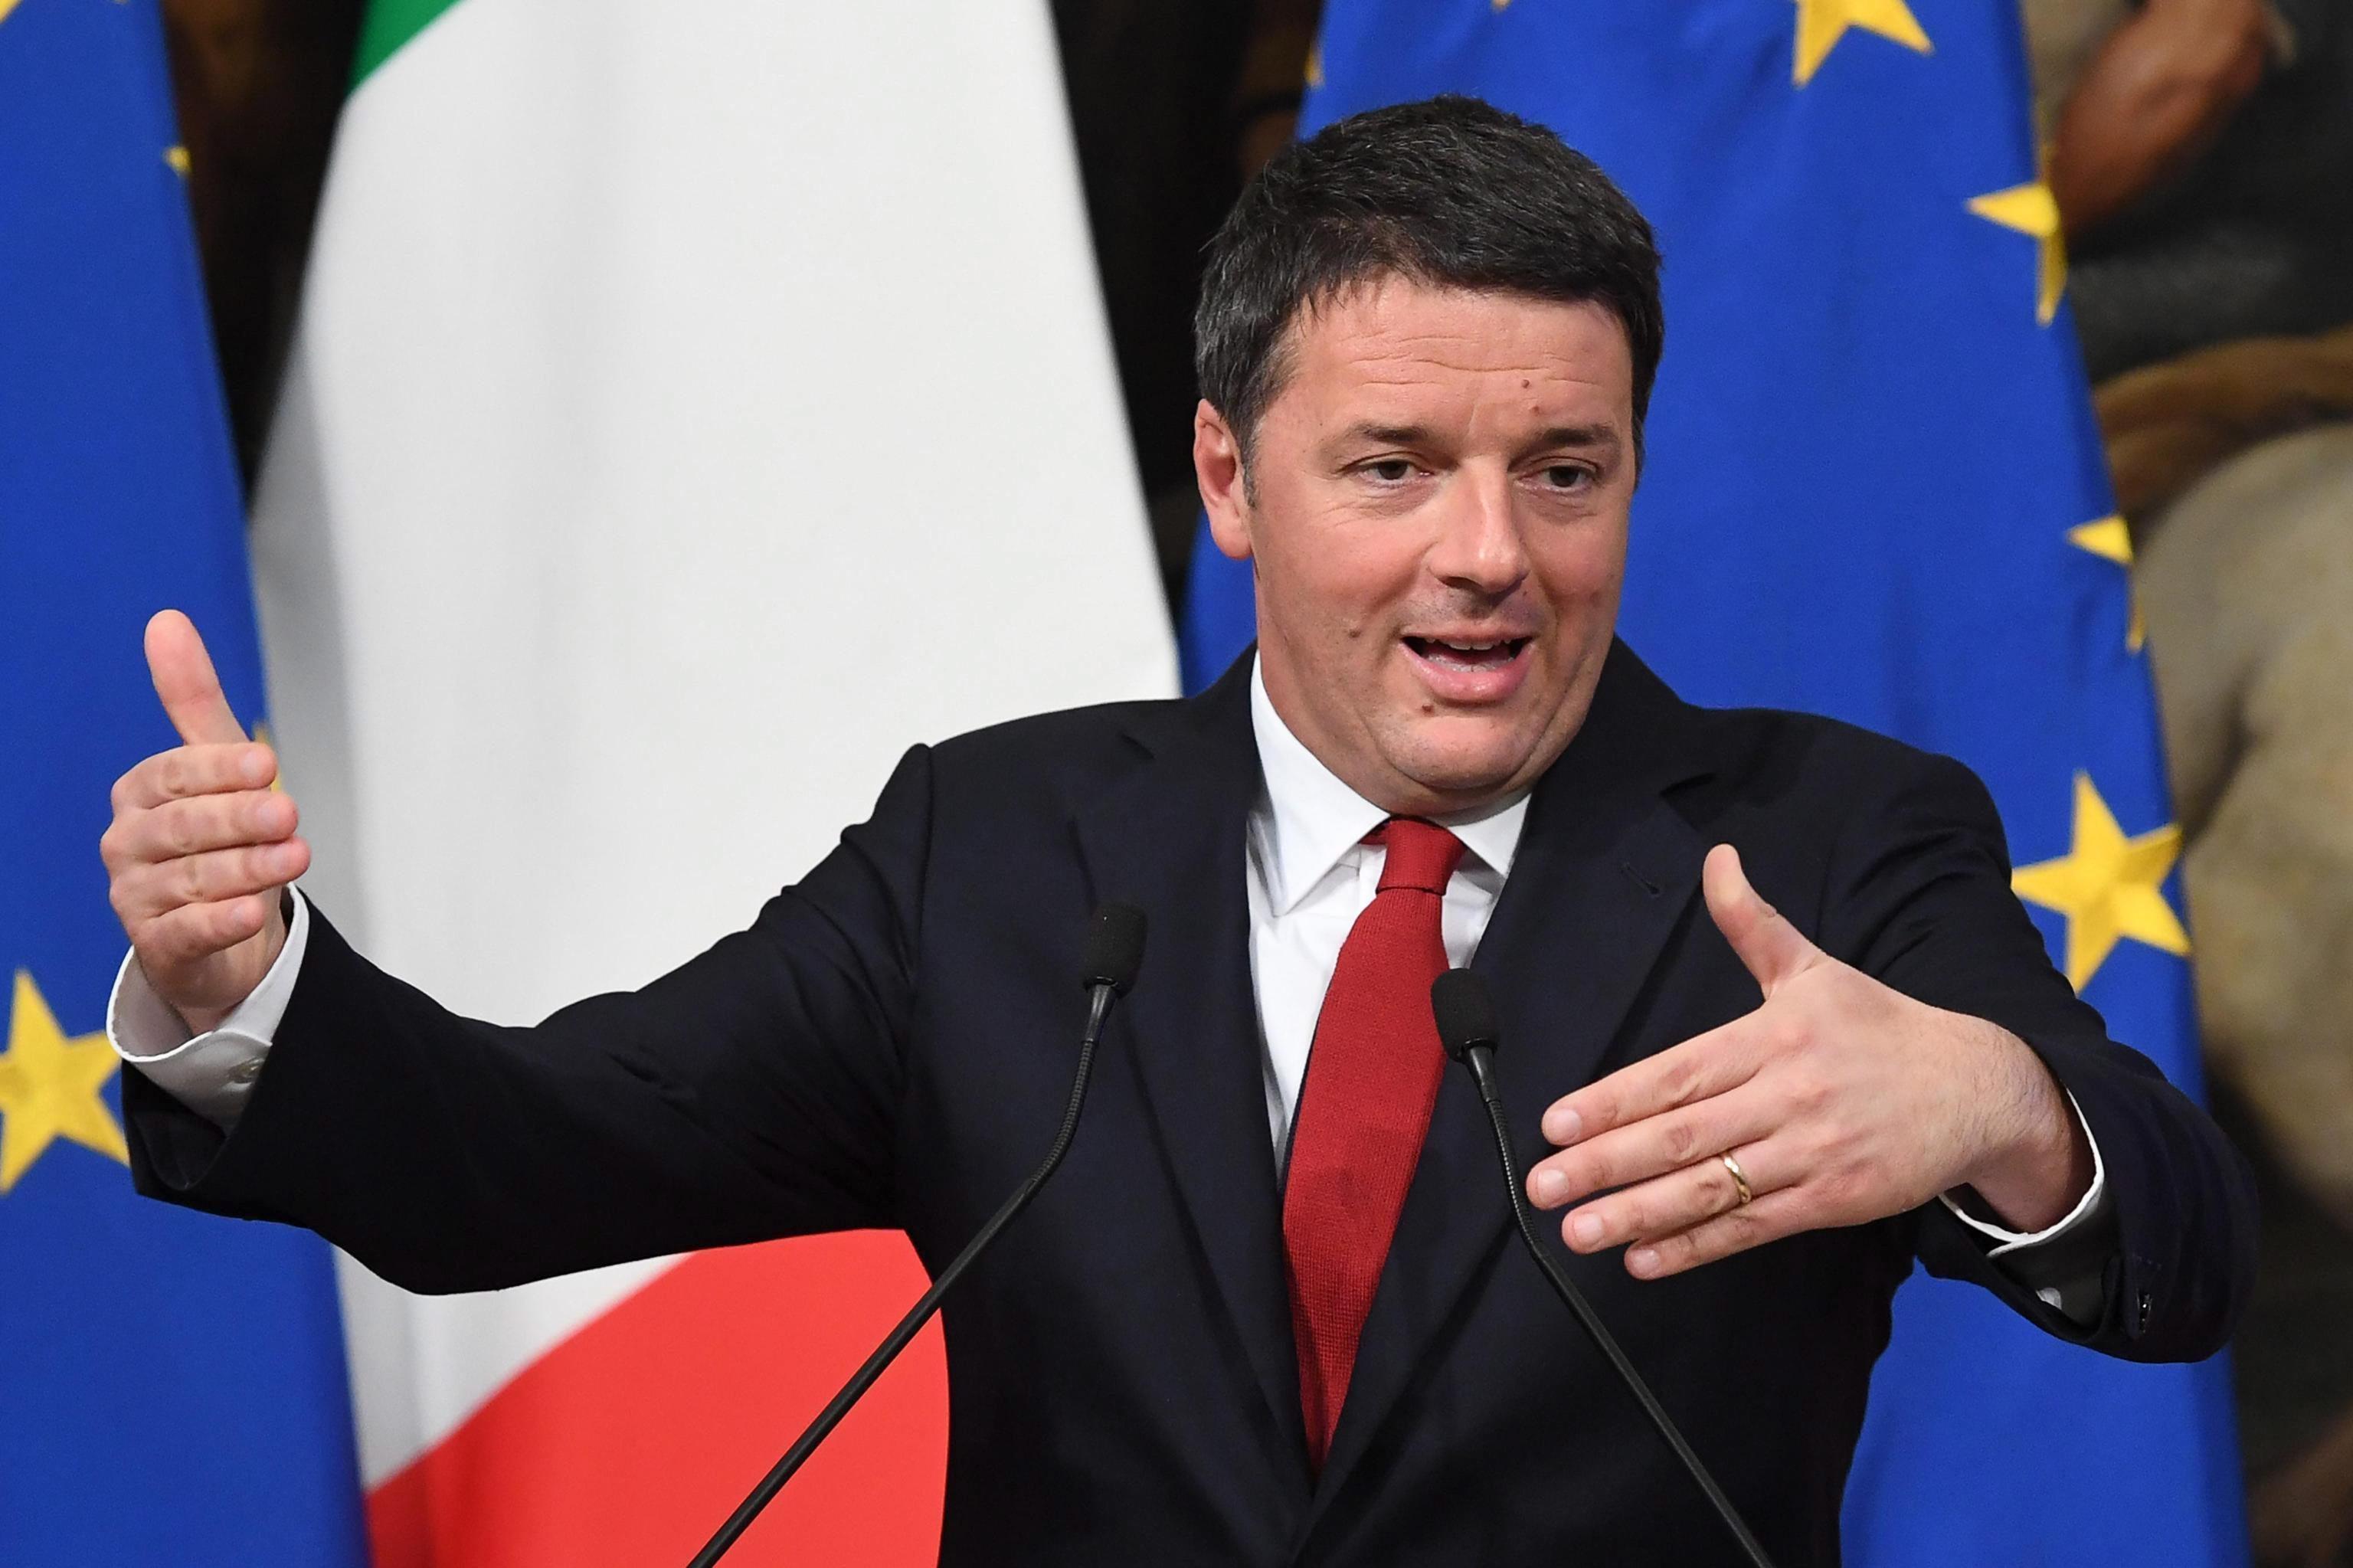 Albert Rivera se reunirá con Mateo Renzi en Roma (Italia)